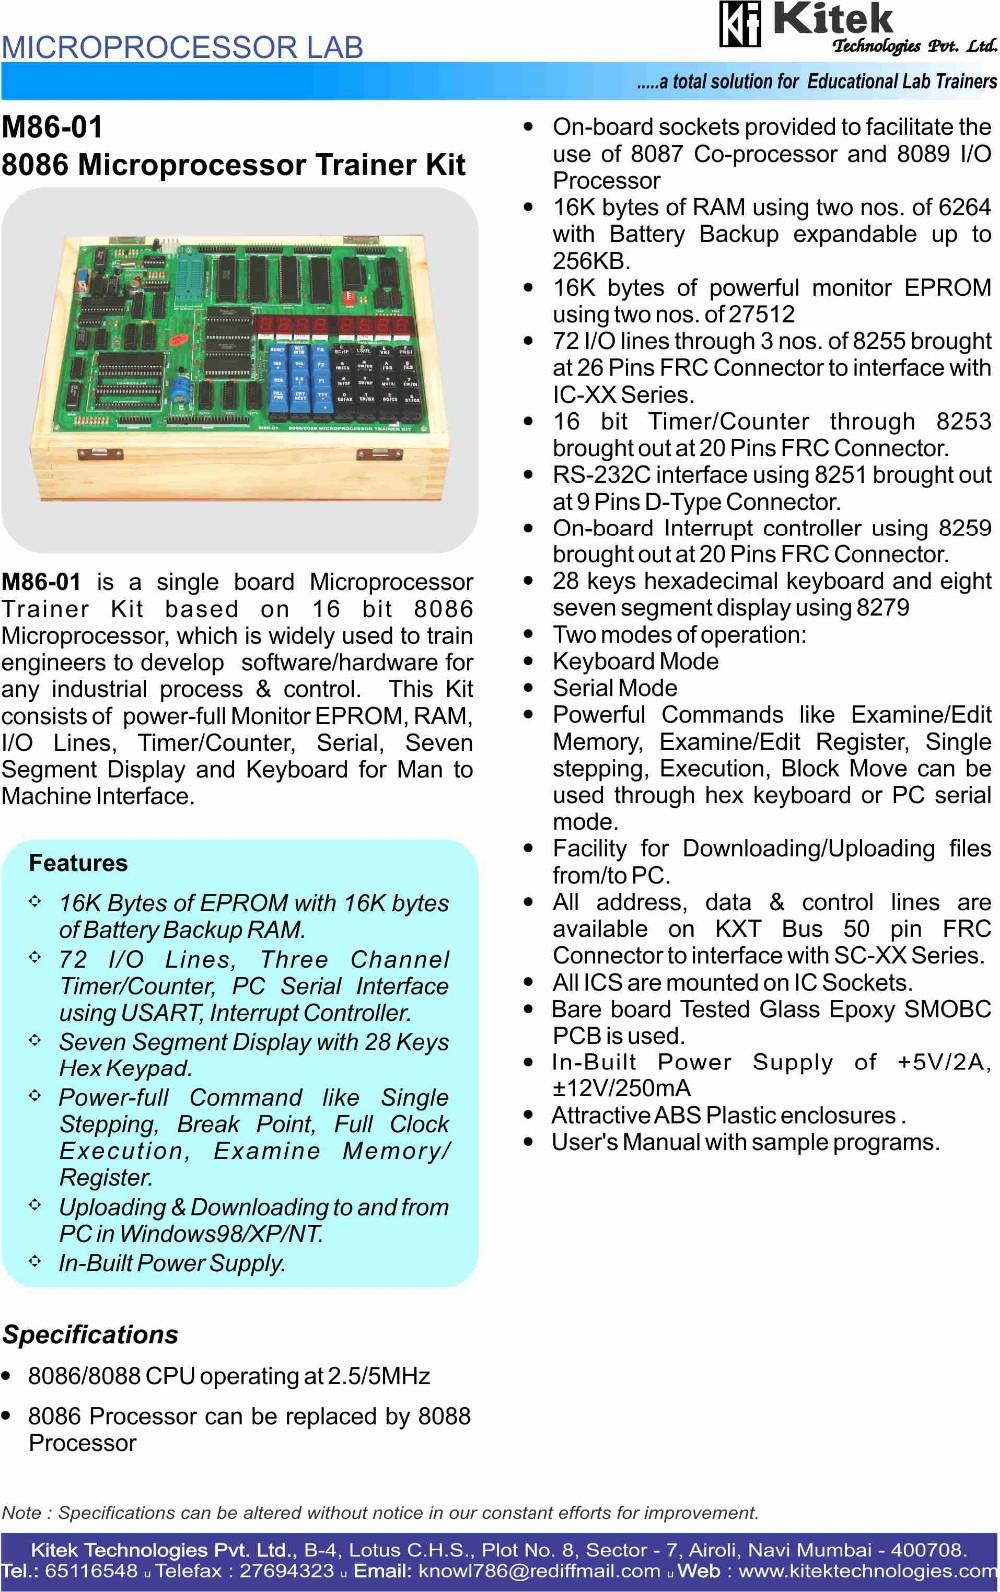 8086 Microprocessor Trainer Kit / 8086 Trainer Kit / Seven Segment Display  8086 Trainer Kit - Buy 8086 Microprocessor Trainer Kit,8086 Trainer